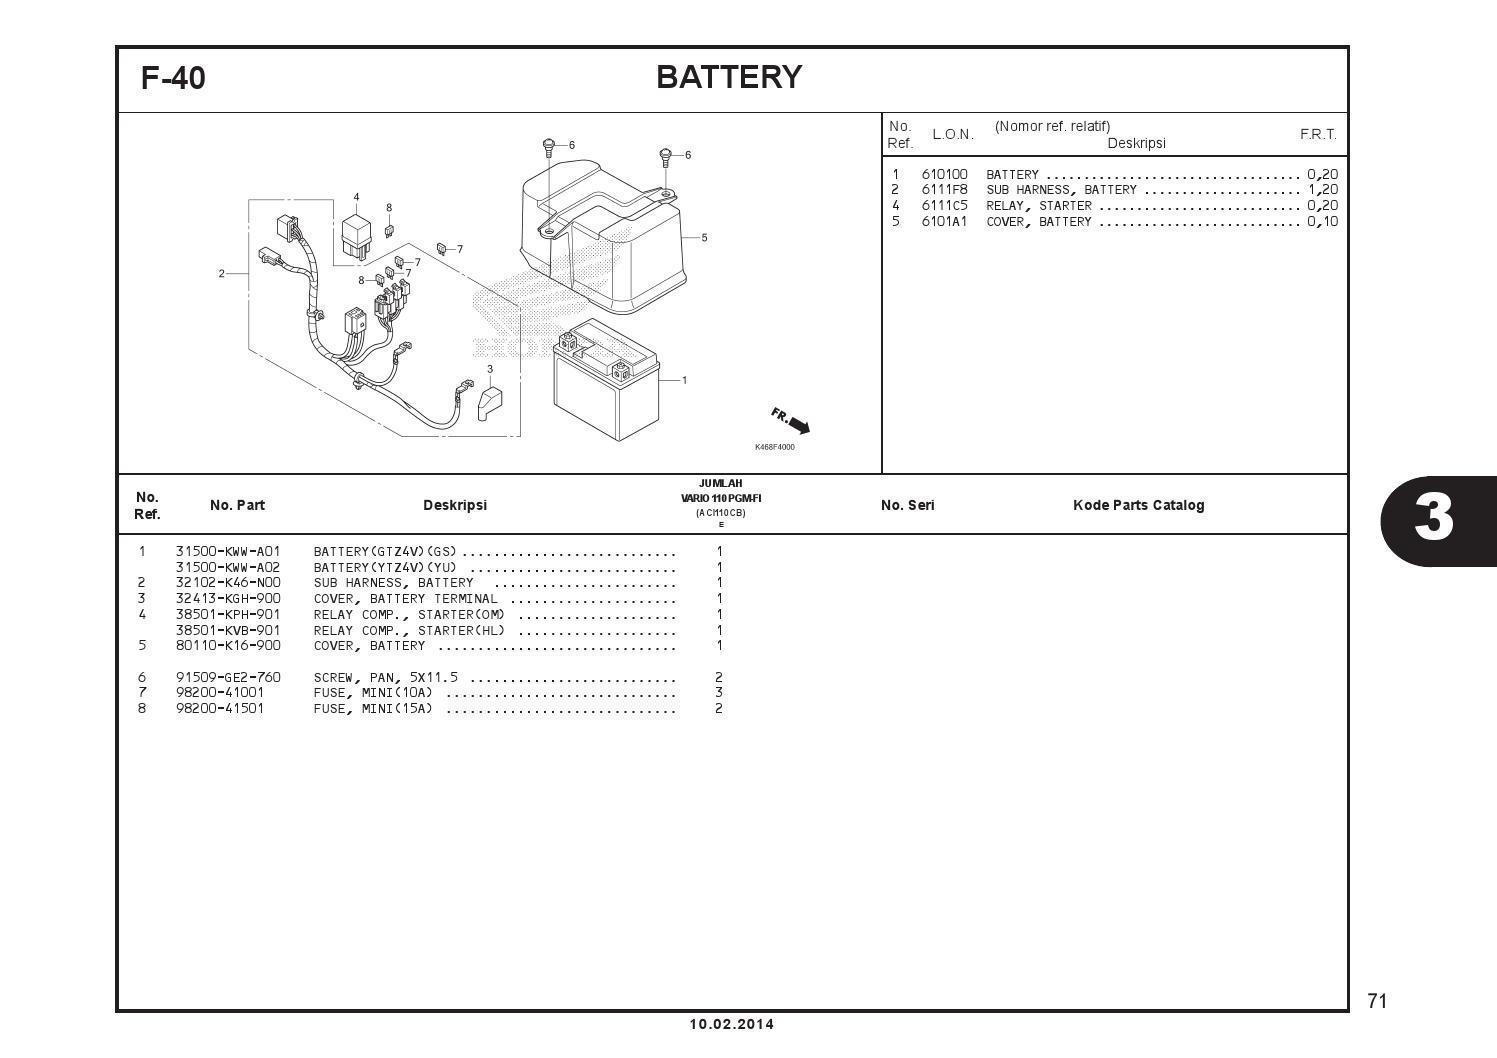 Kode Terminal Relay Channel Module Summerfuel Robotics Vario 110 Led Fi By Heru Cahyo Purnomo Issuu